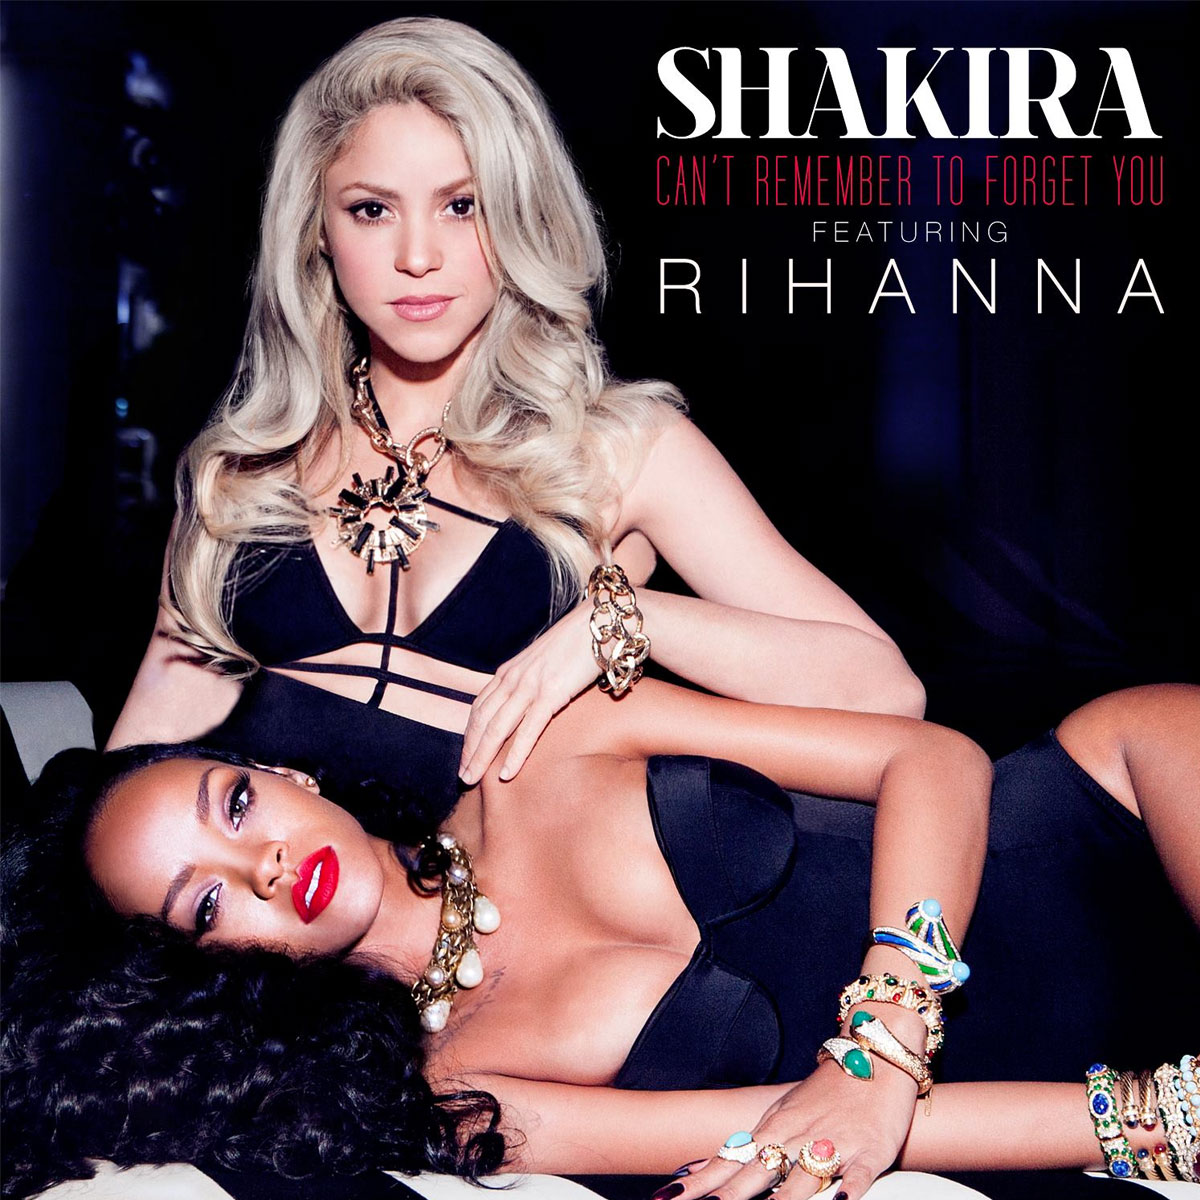 Shakira-Rihanna-CantRemember